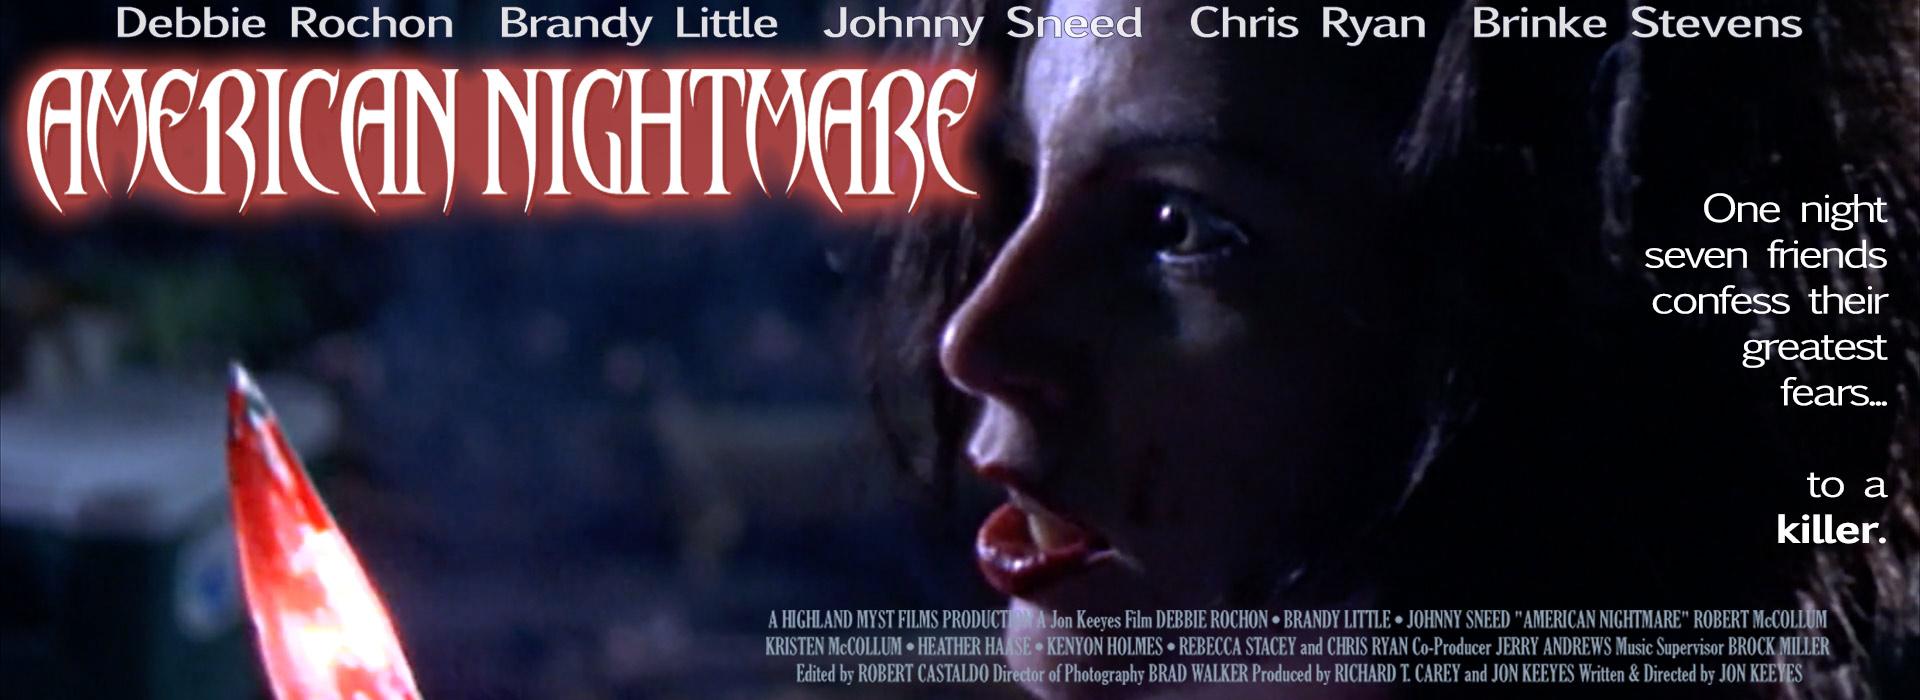 American Nightmare 2002 american nightmare | highland myst entertainment